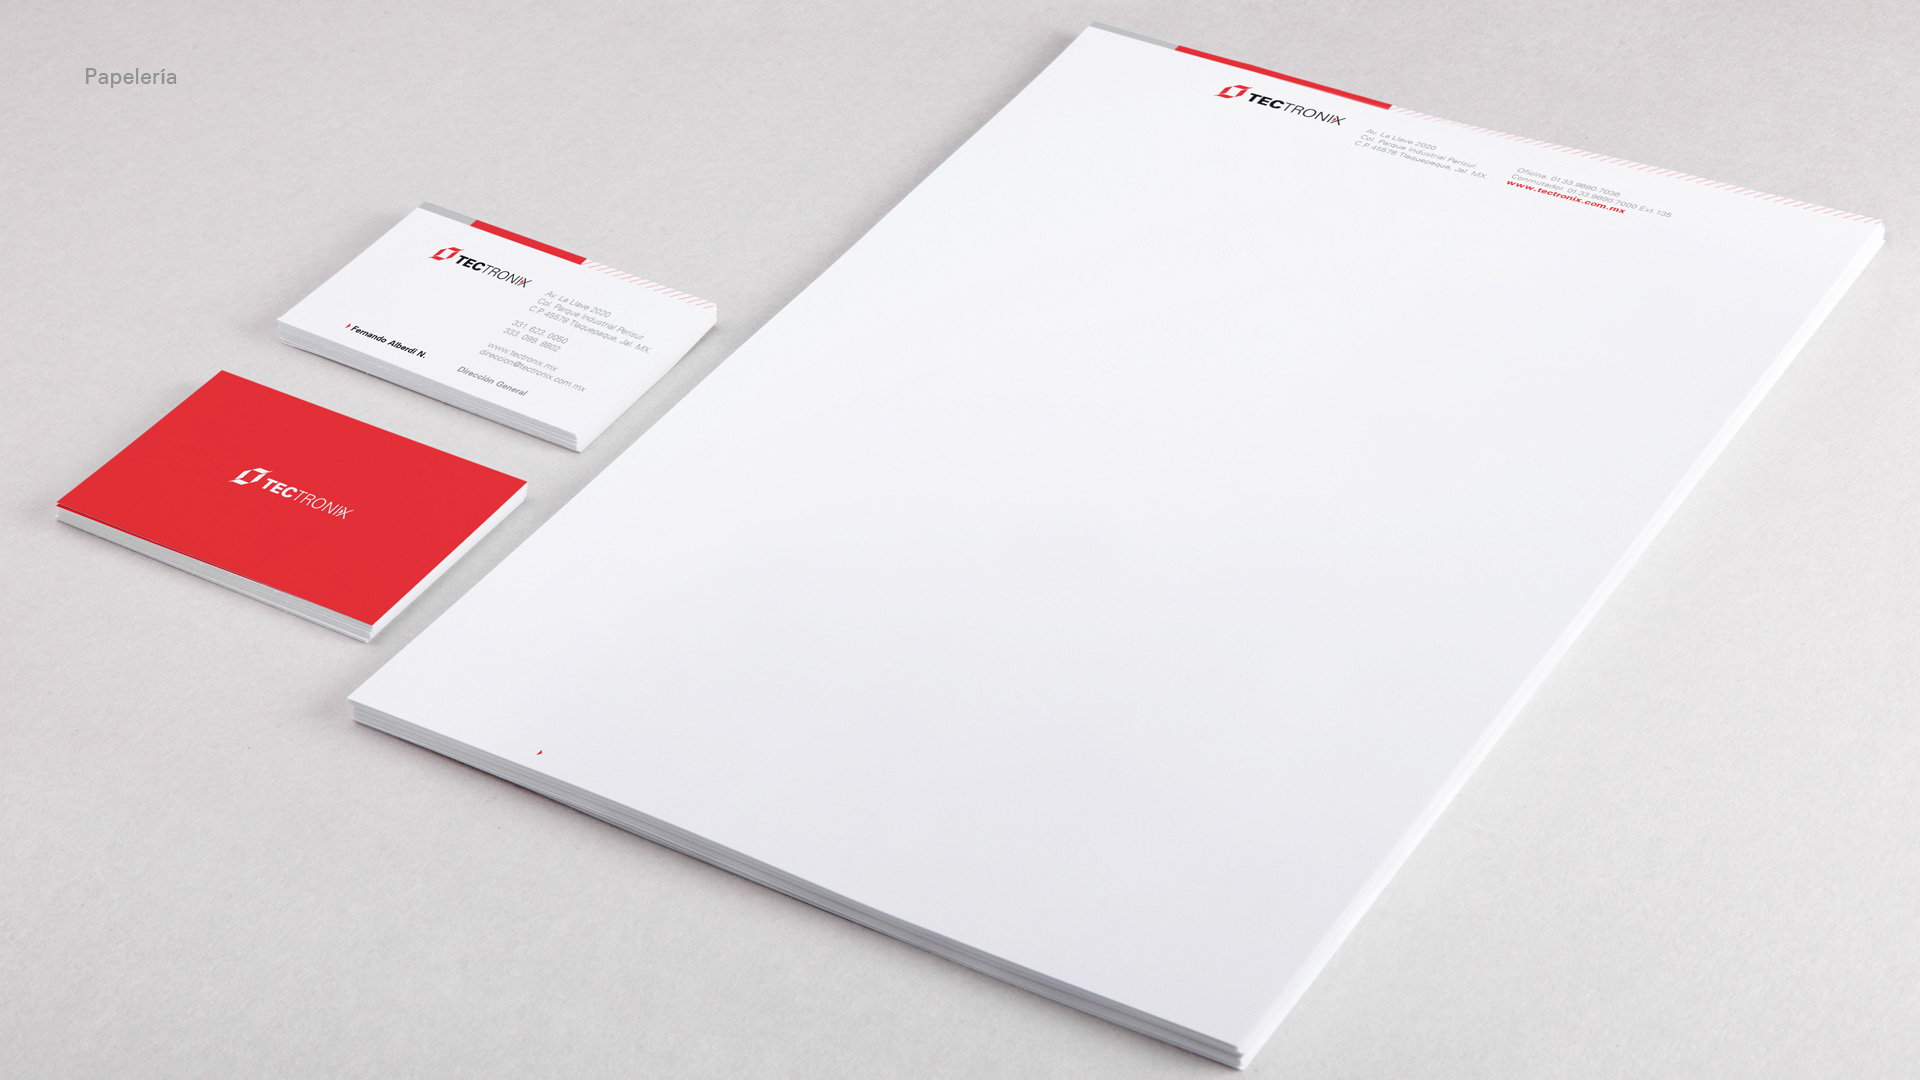 Identidad-corporativa-tectronix-hoja-membretada-tarjetas-presentacion